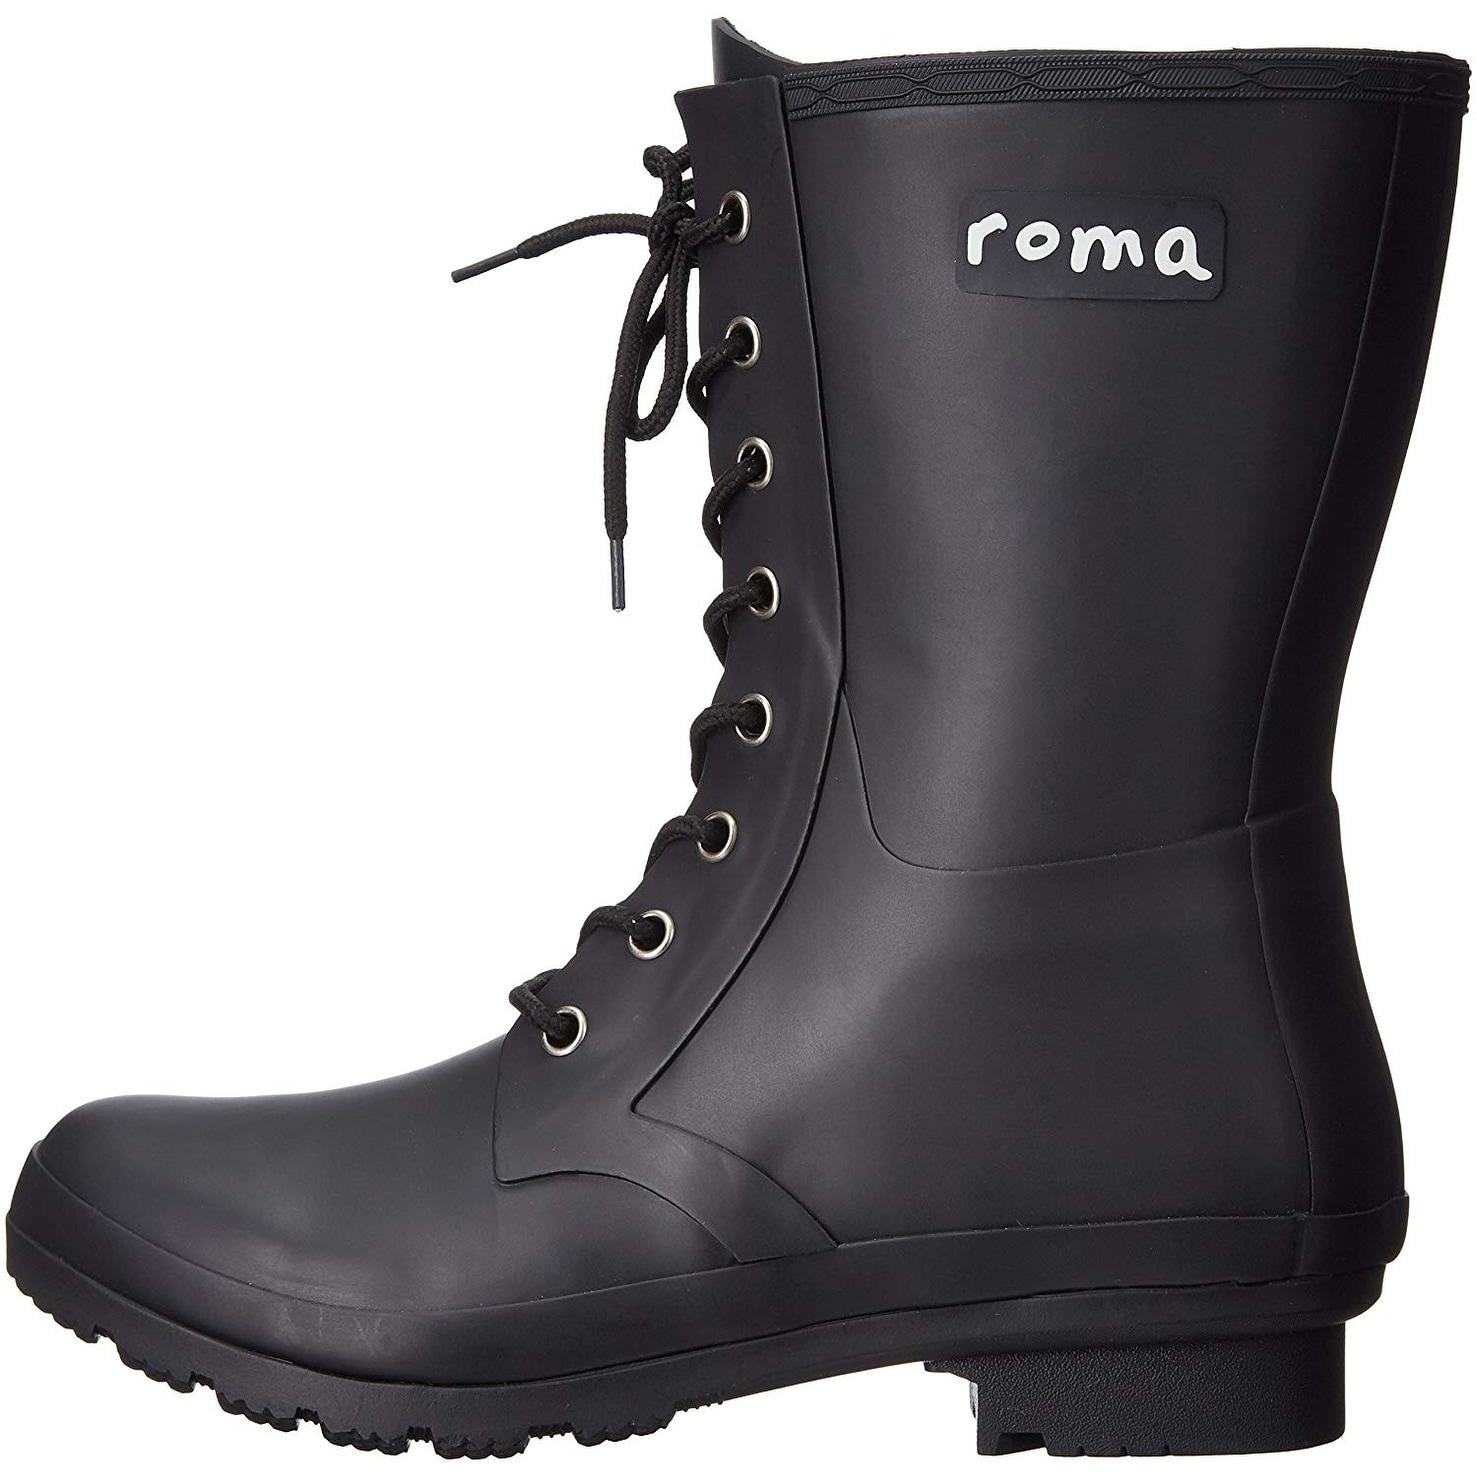 62201a55e Roma Boots Women's EPAGA Short Lace-up Rain Boots